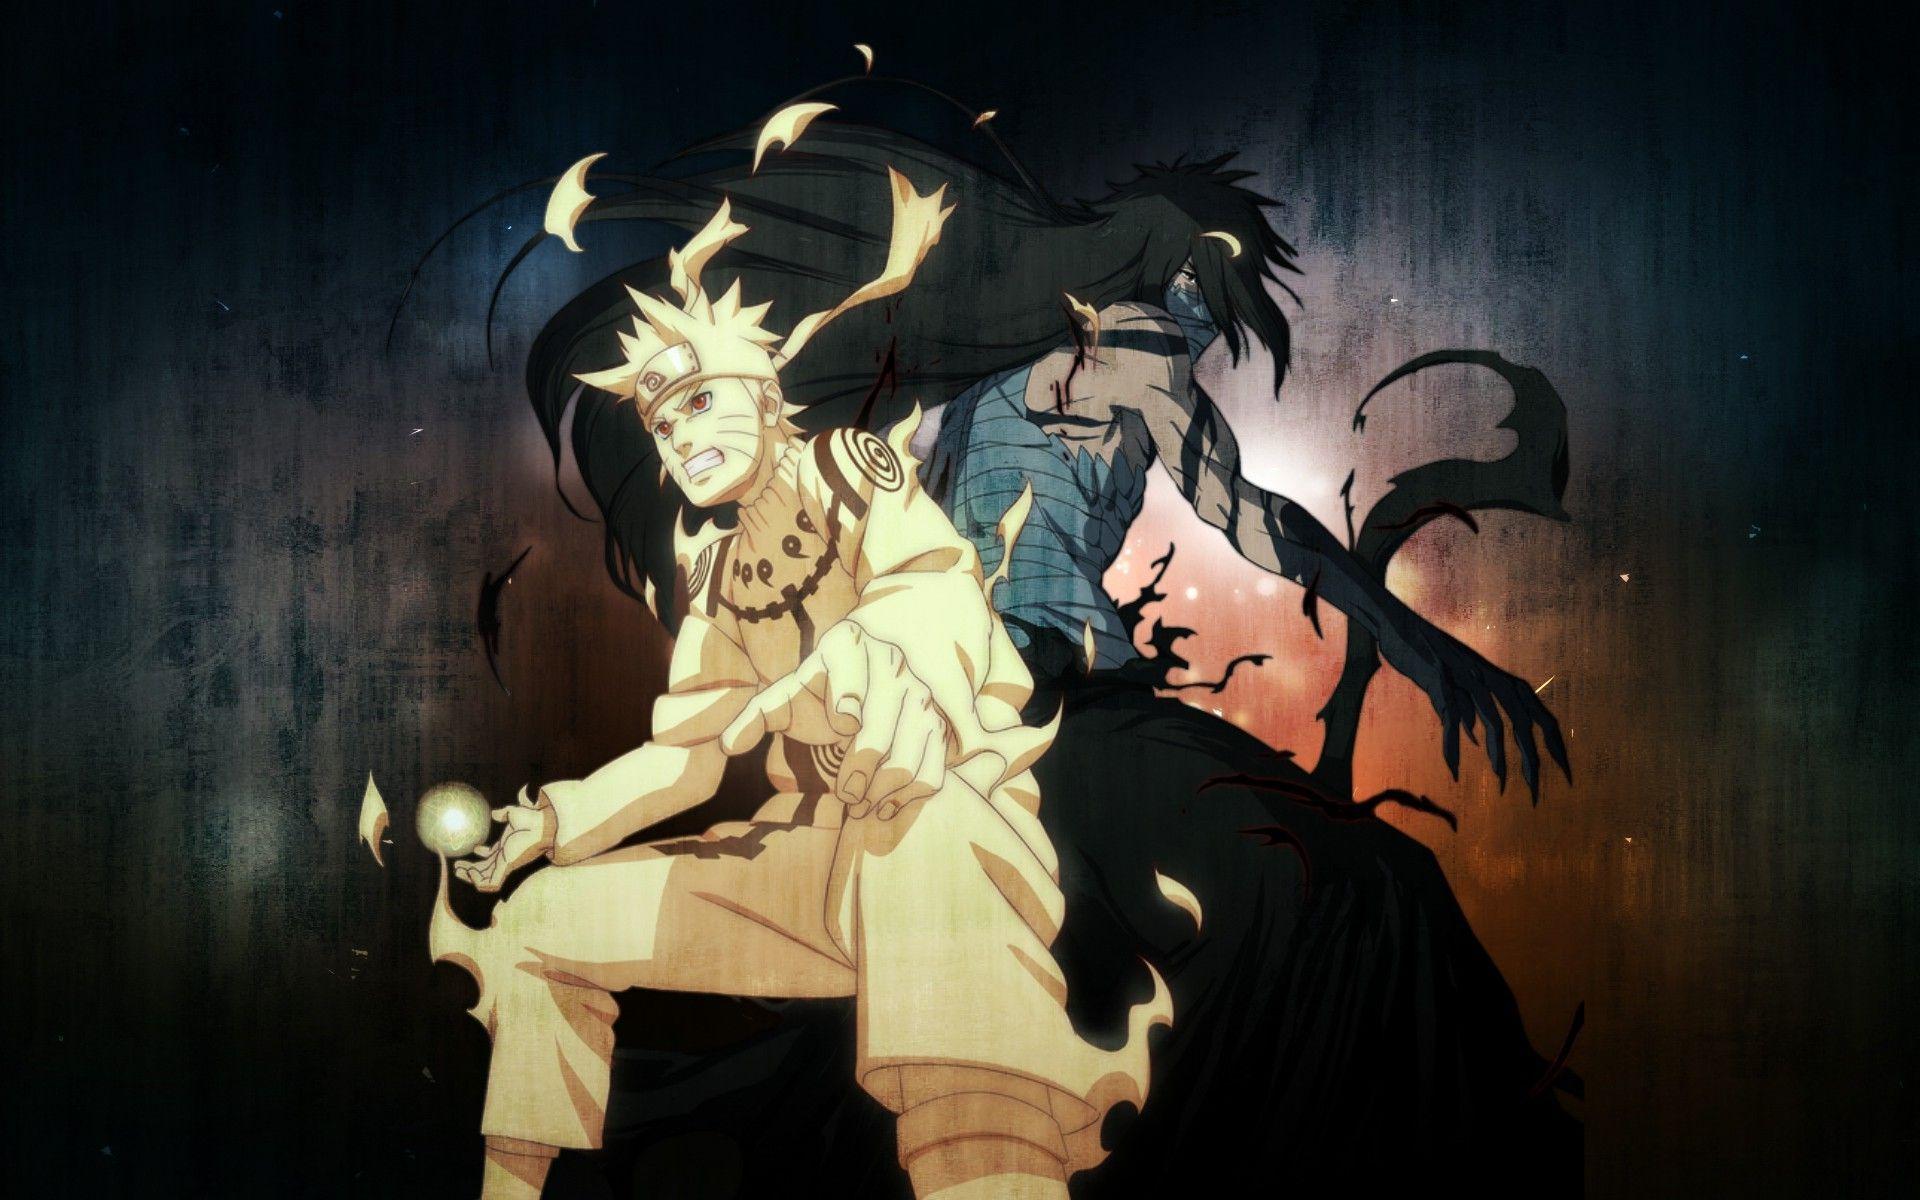 Good Wallpaper Naruto Top - best-naruto-wallpapers-28  Trends.jpg